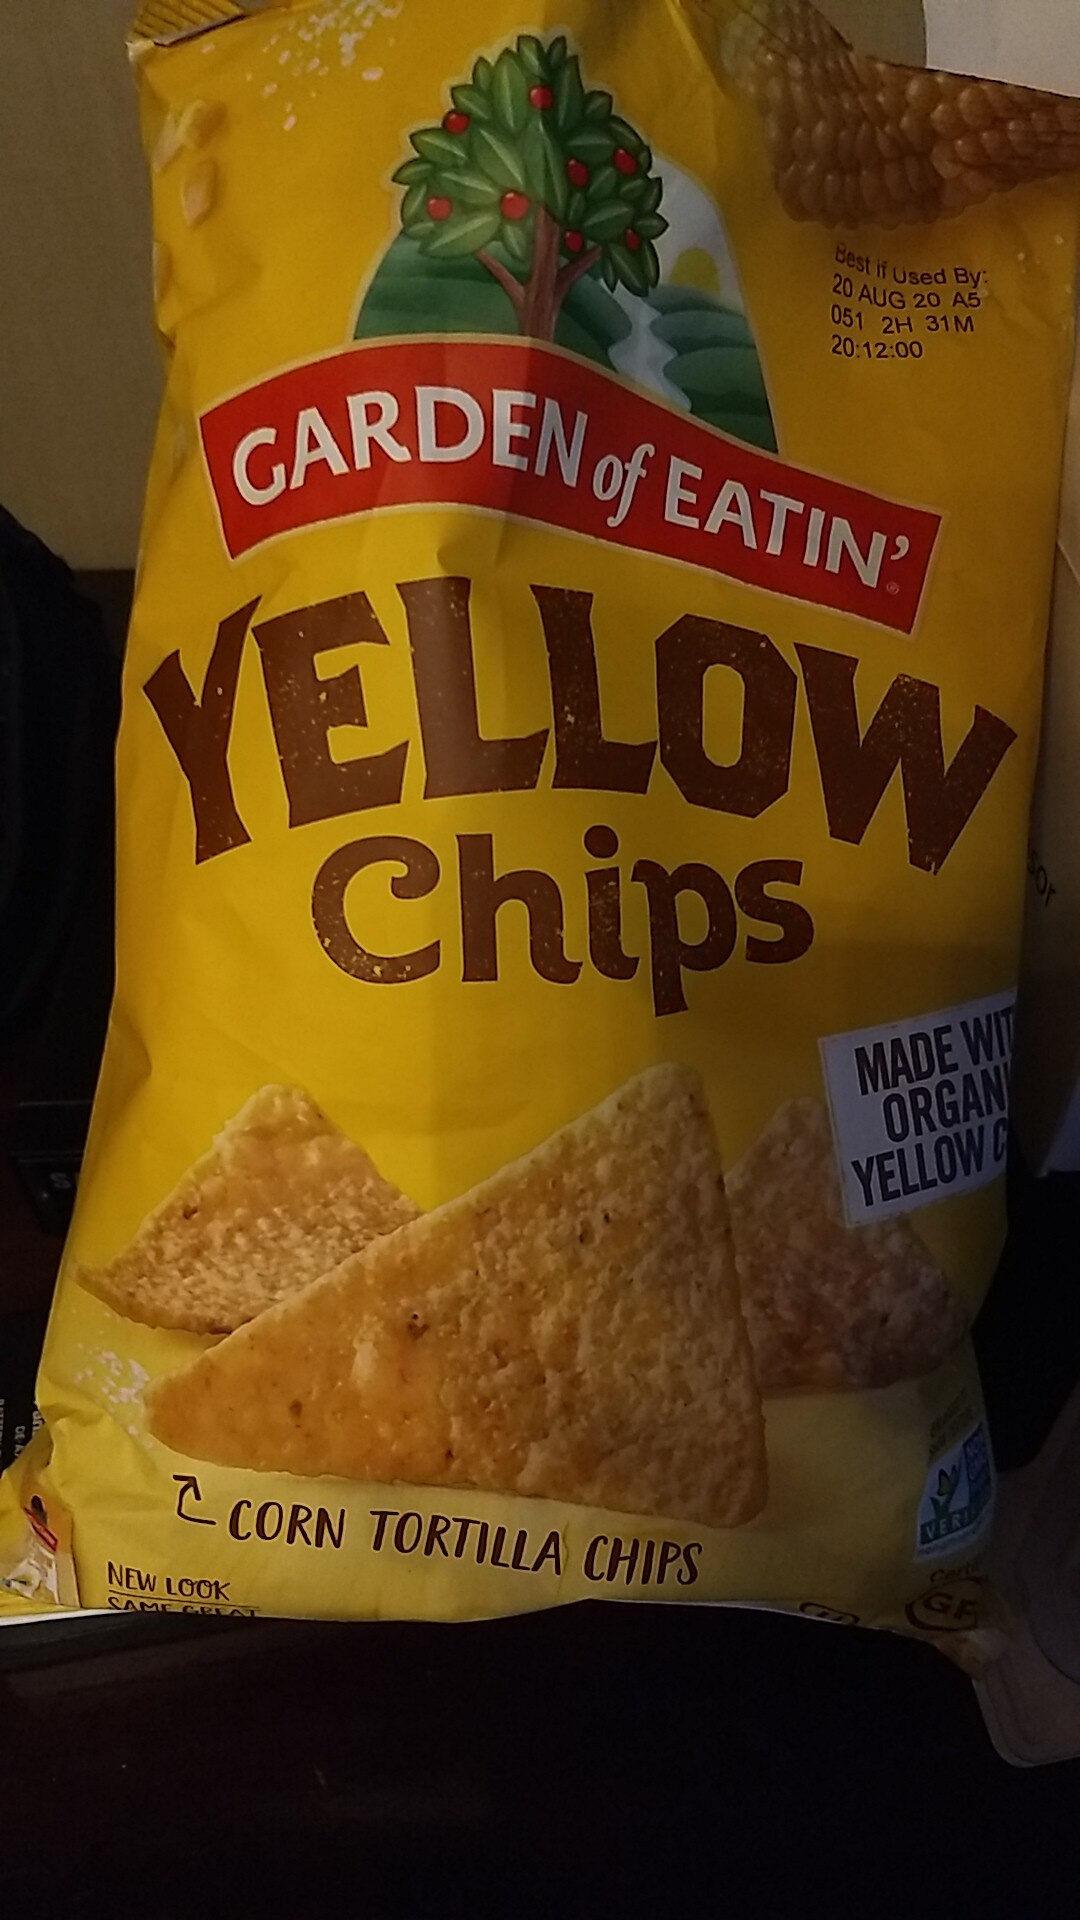 Yellow Chips - Produit - en